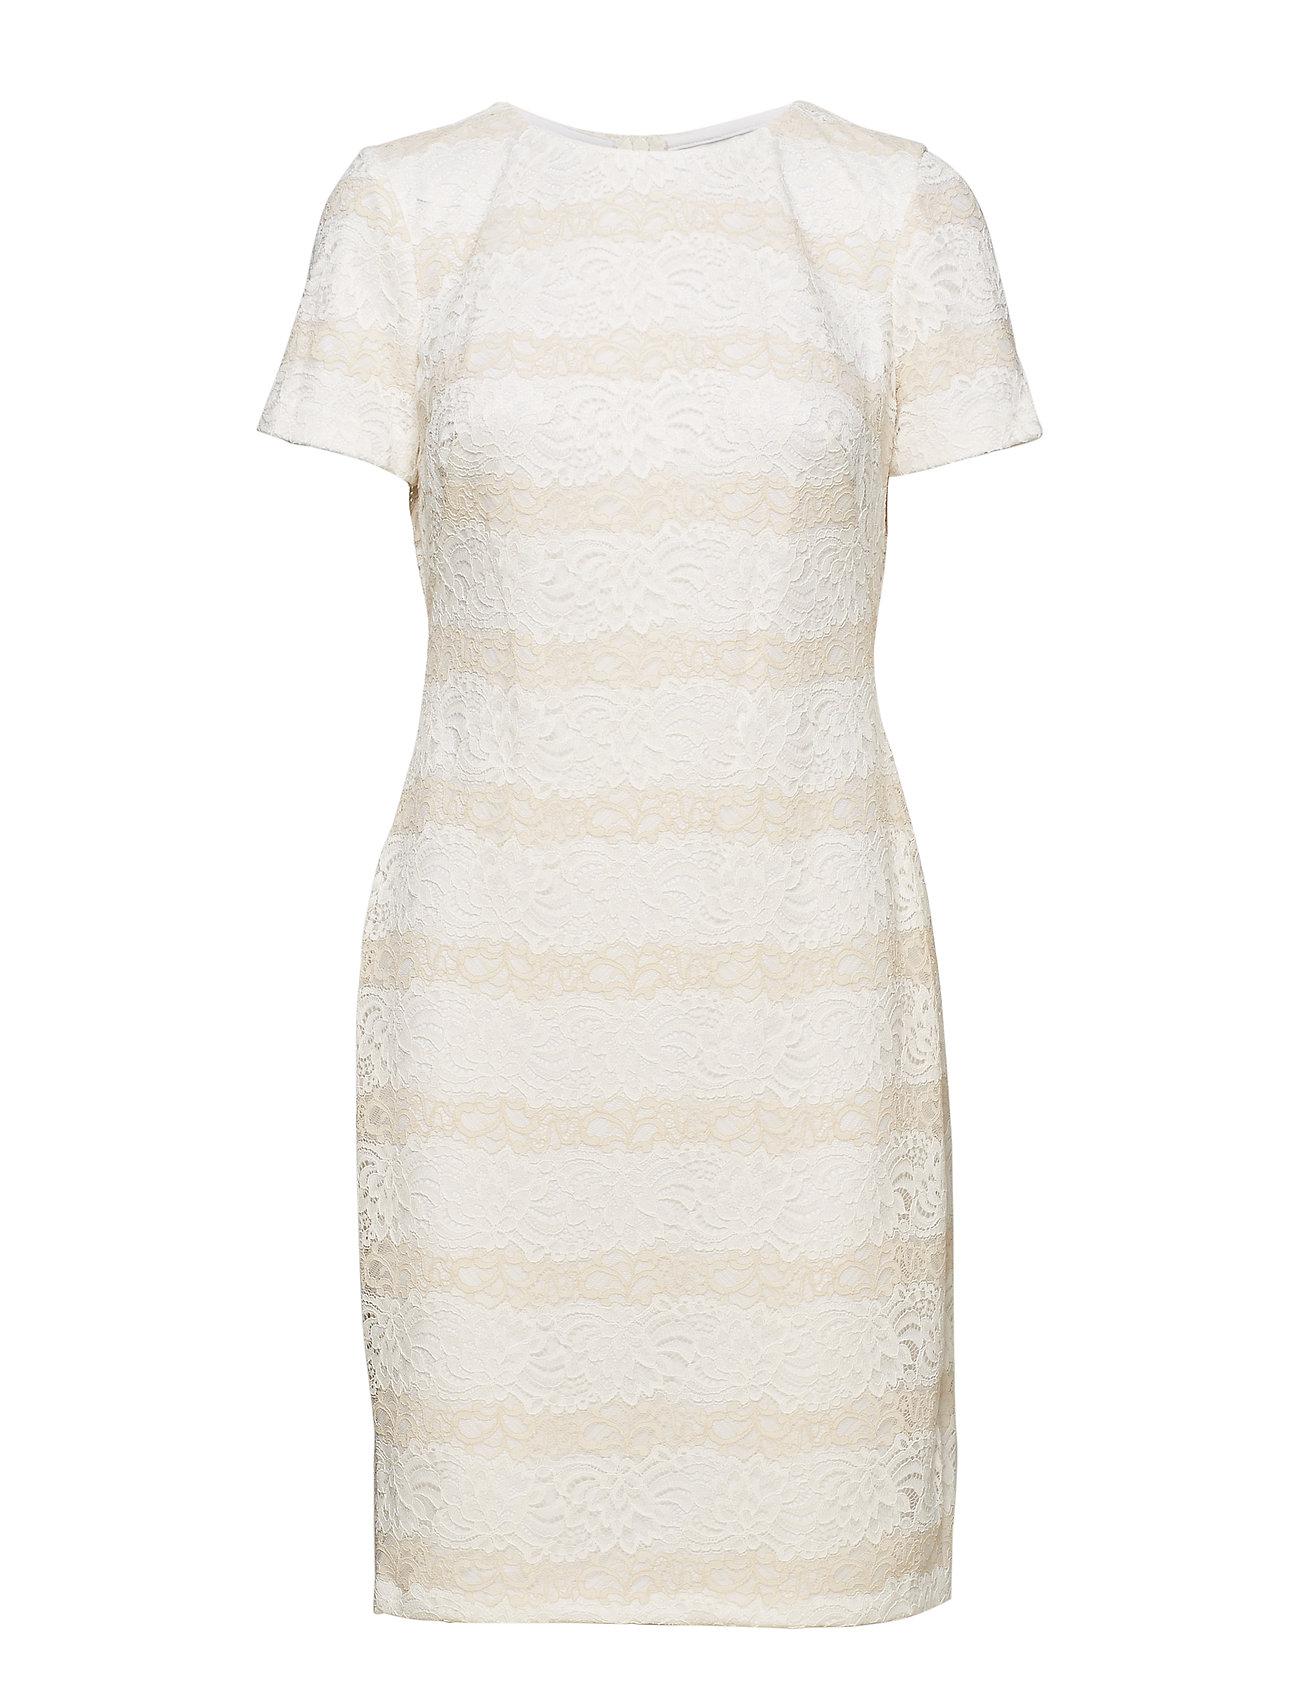 Lauren Ralph Lauren Striped Lace Dress - LAUREN WHITE/CASH